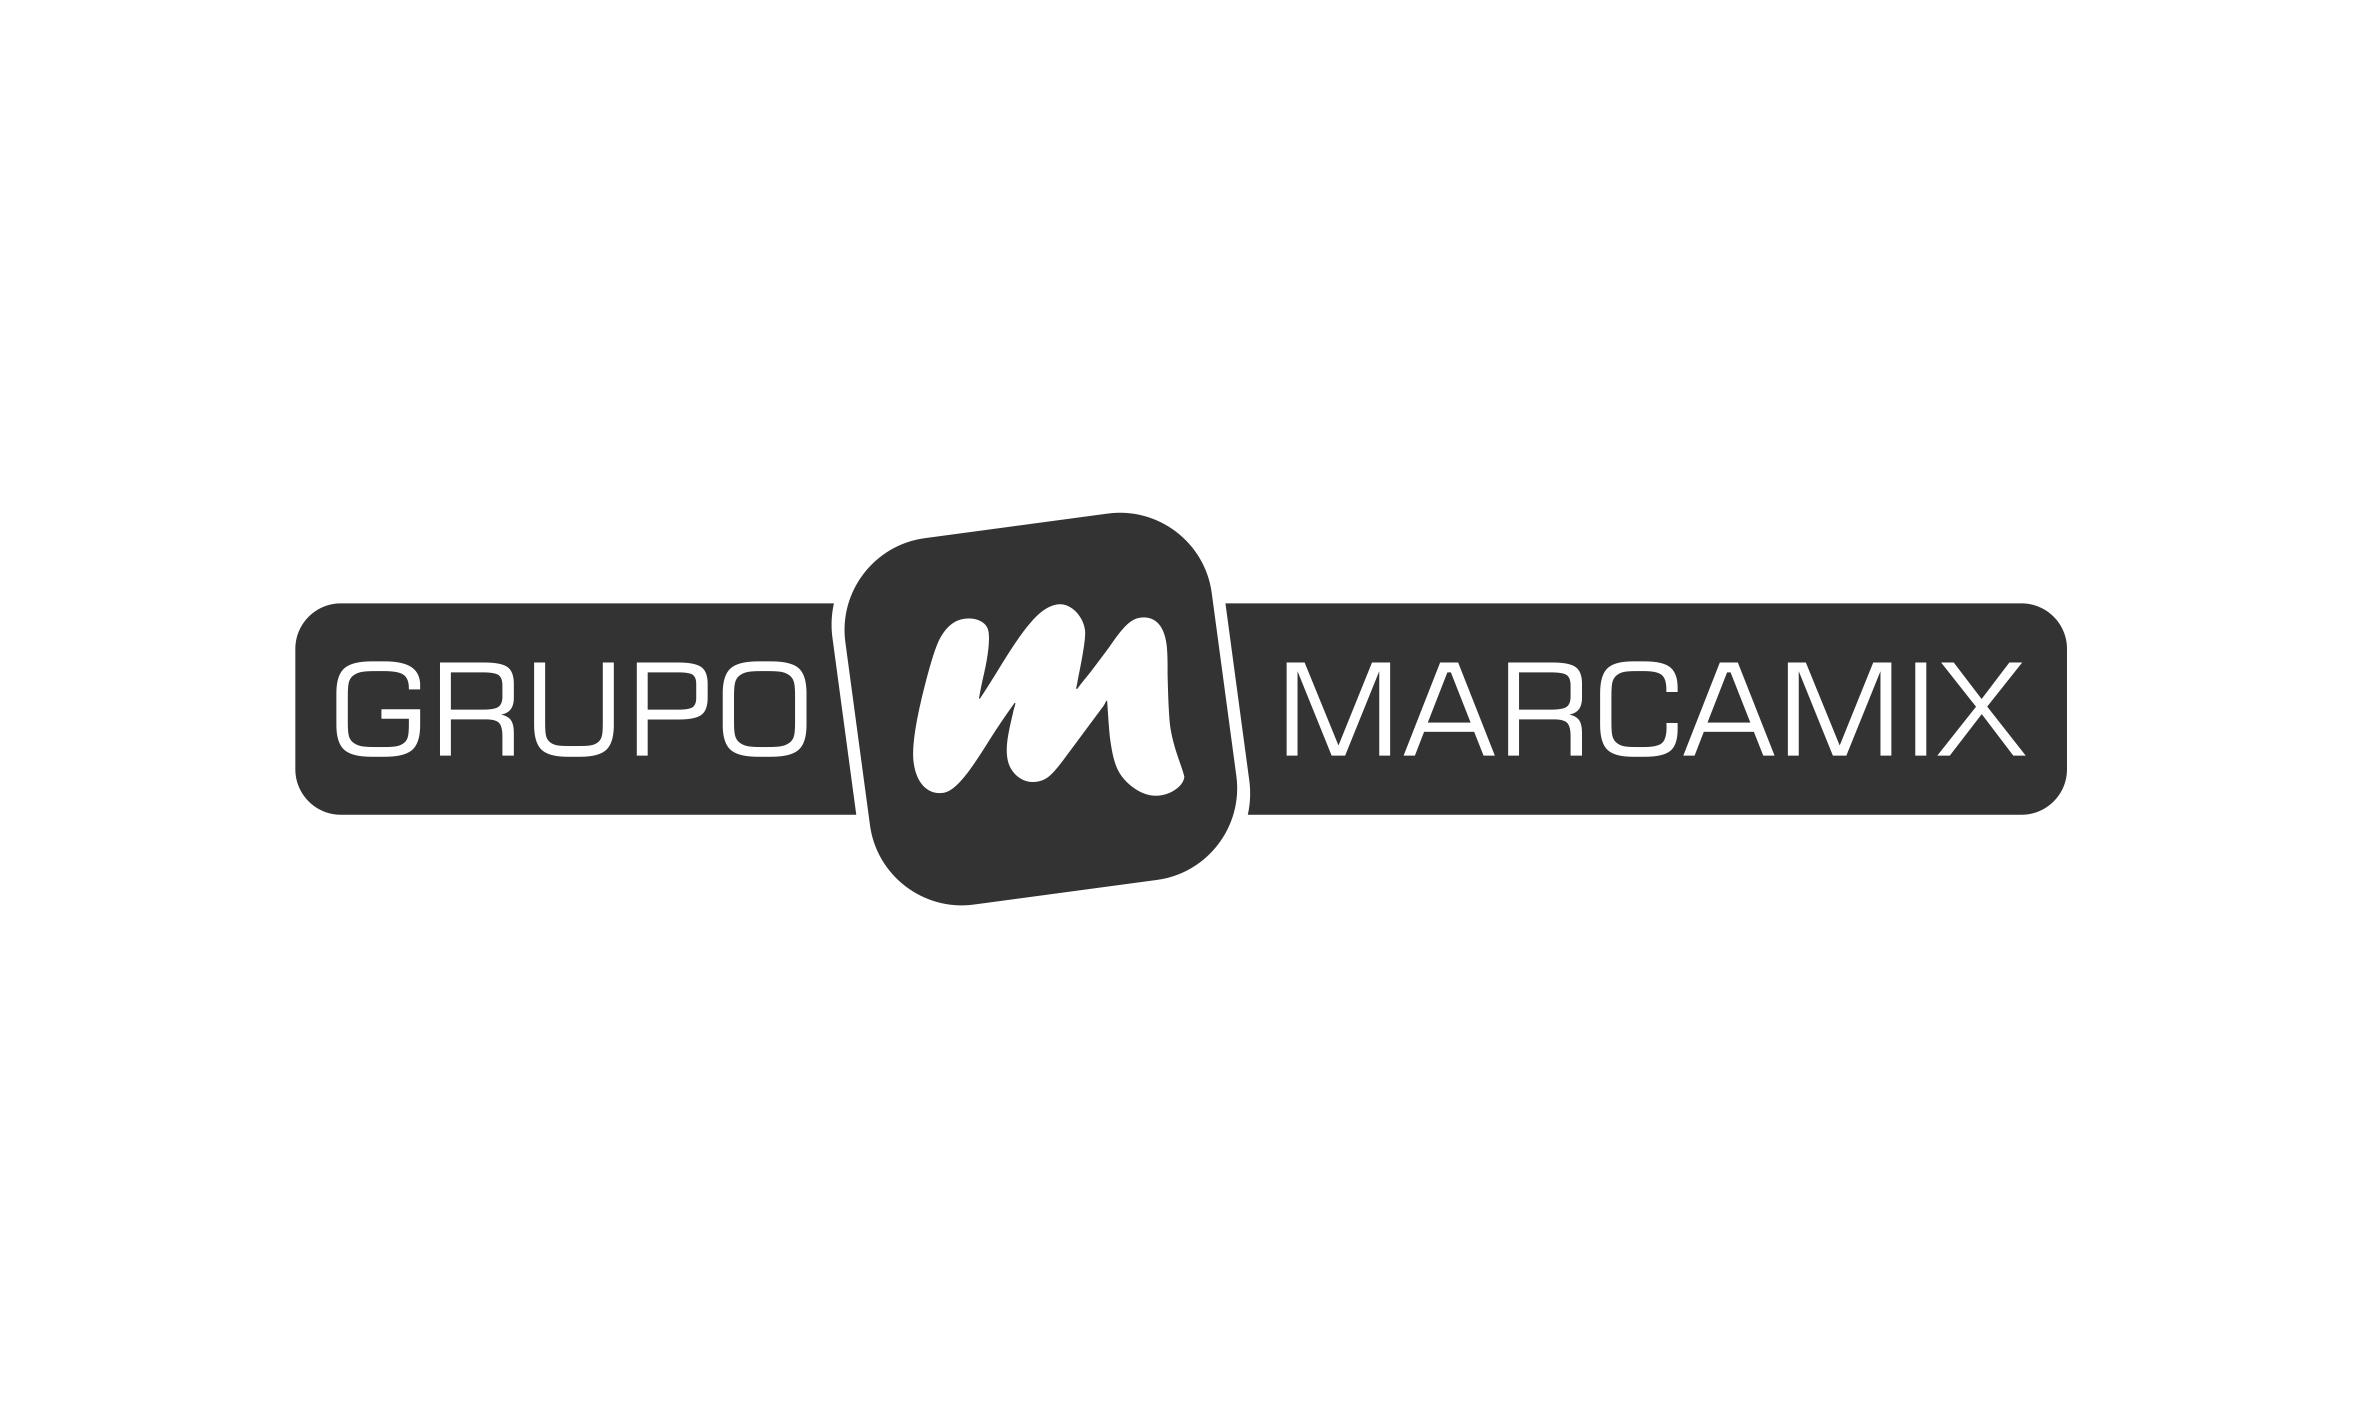 Marcamix